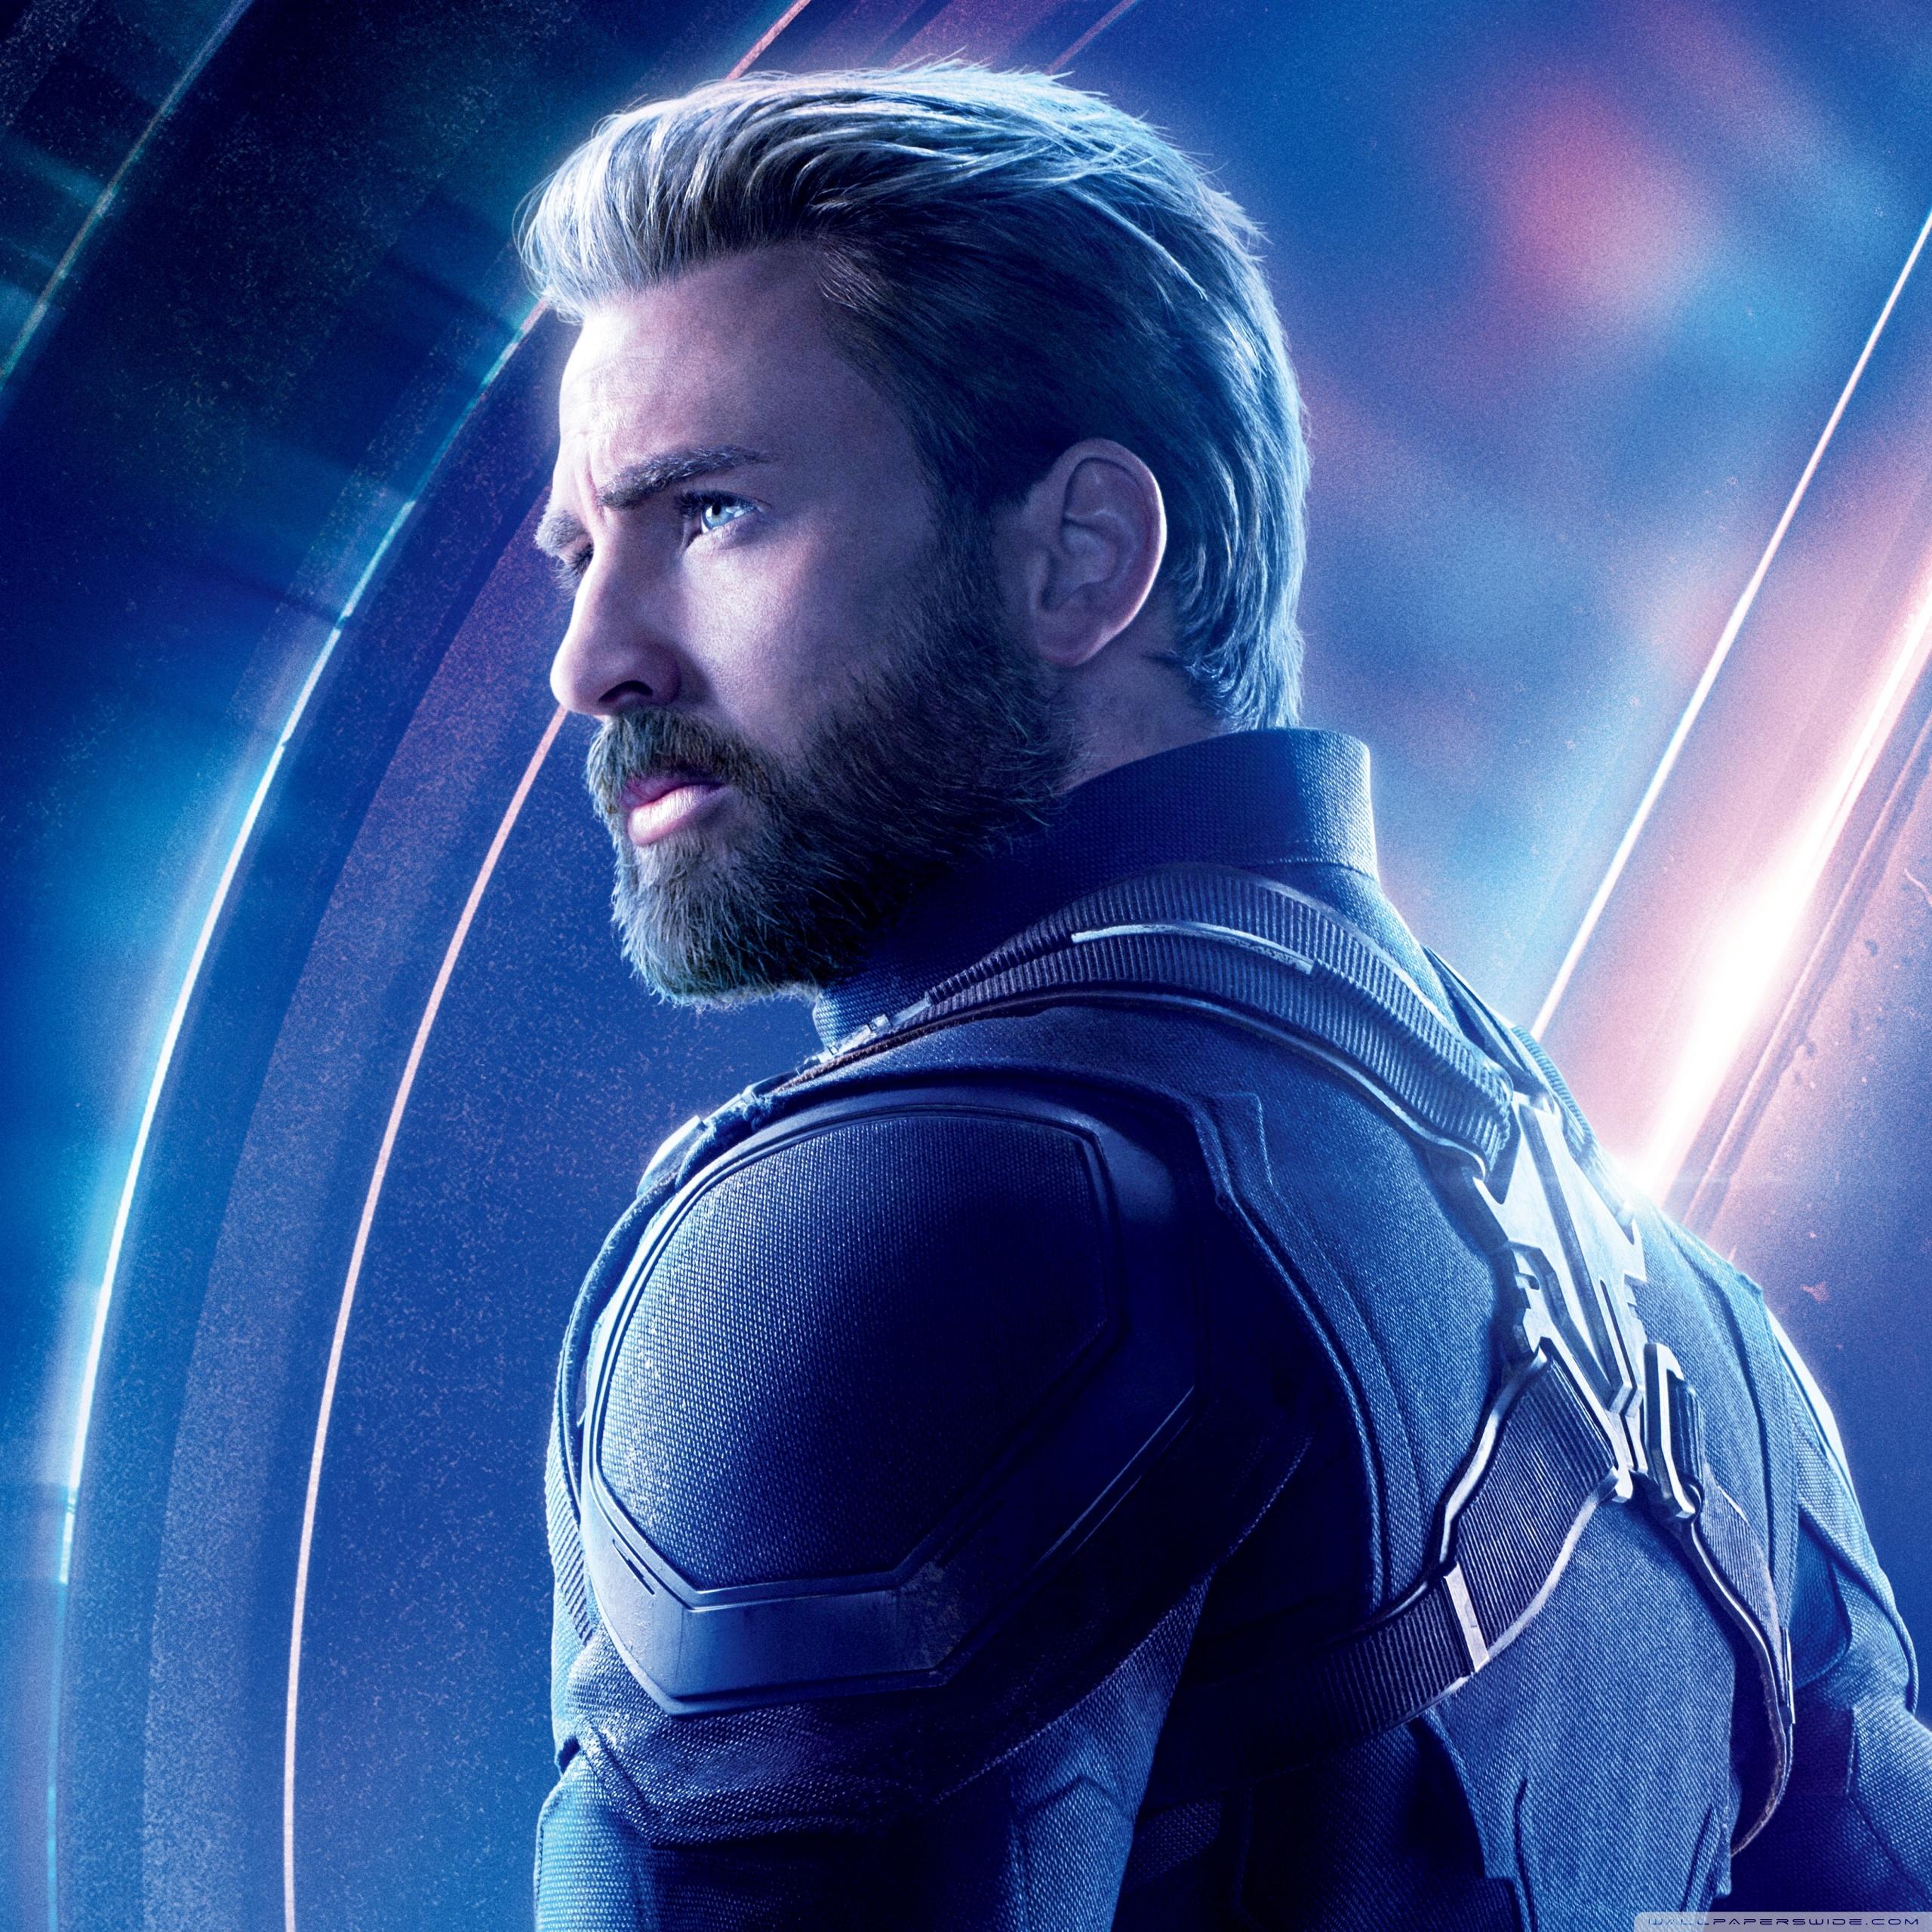 Avengers Infinity War 2018 Movie Captain America 4K HD Desktop 2560x2560